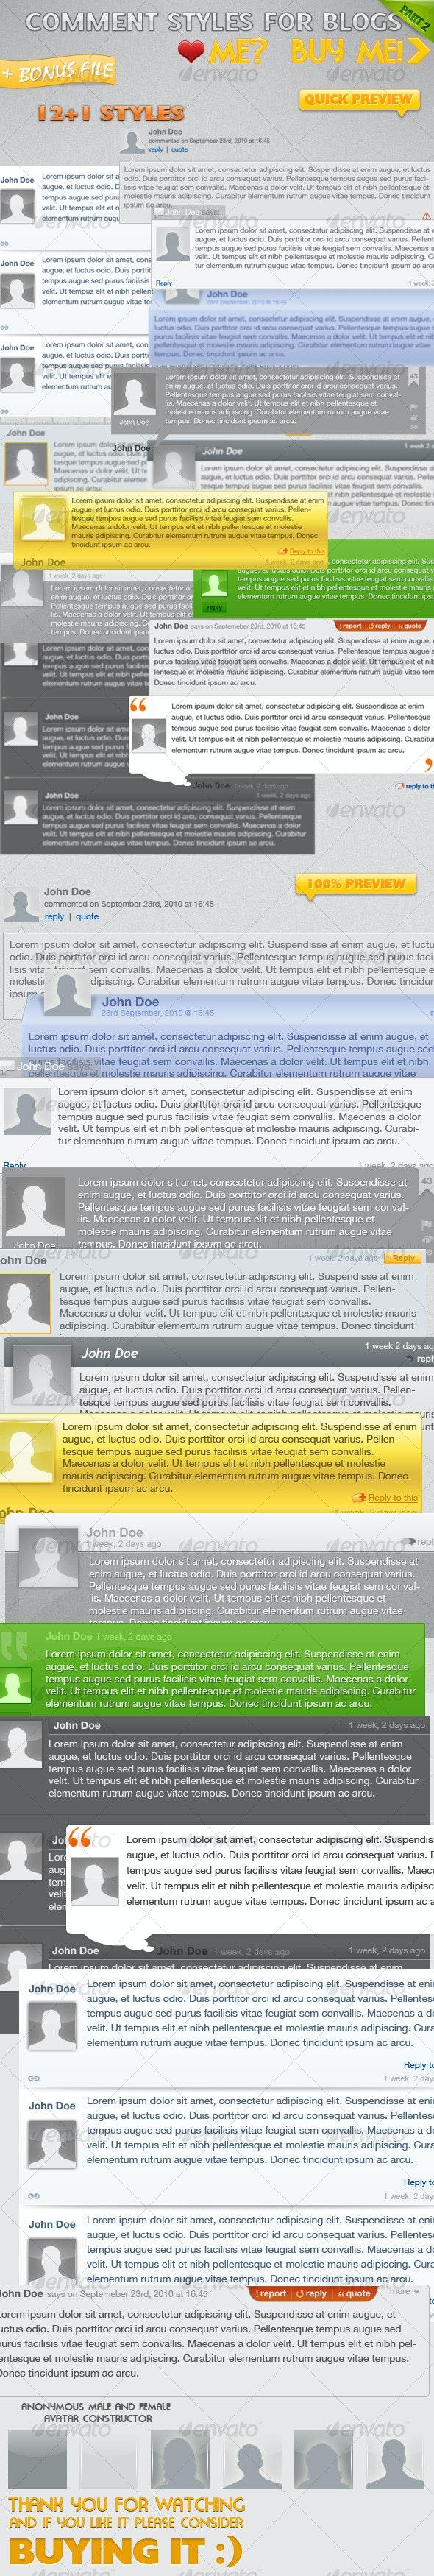 Comment Styles for Your Blog (part 2) - Web Elements